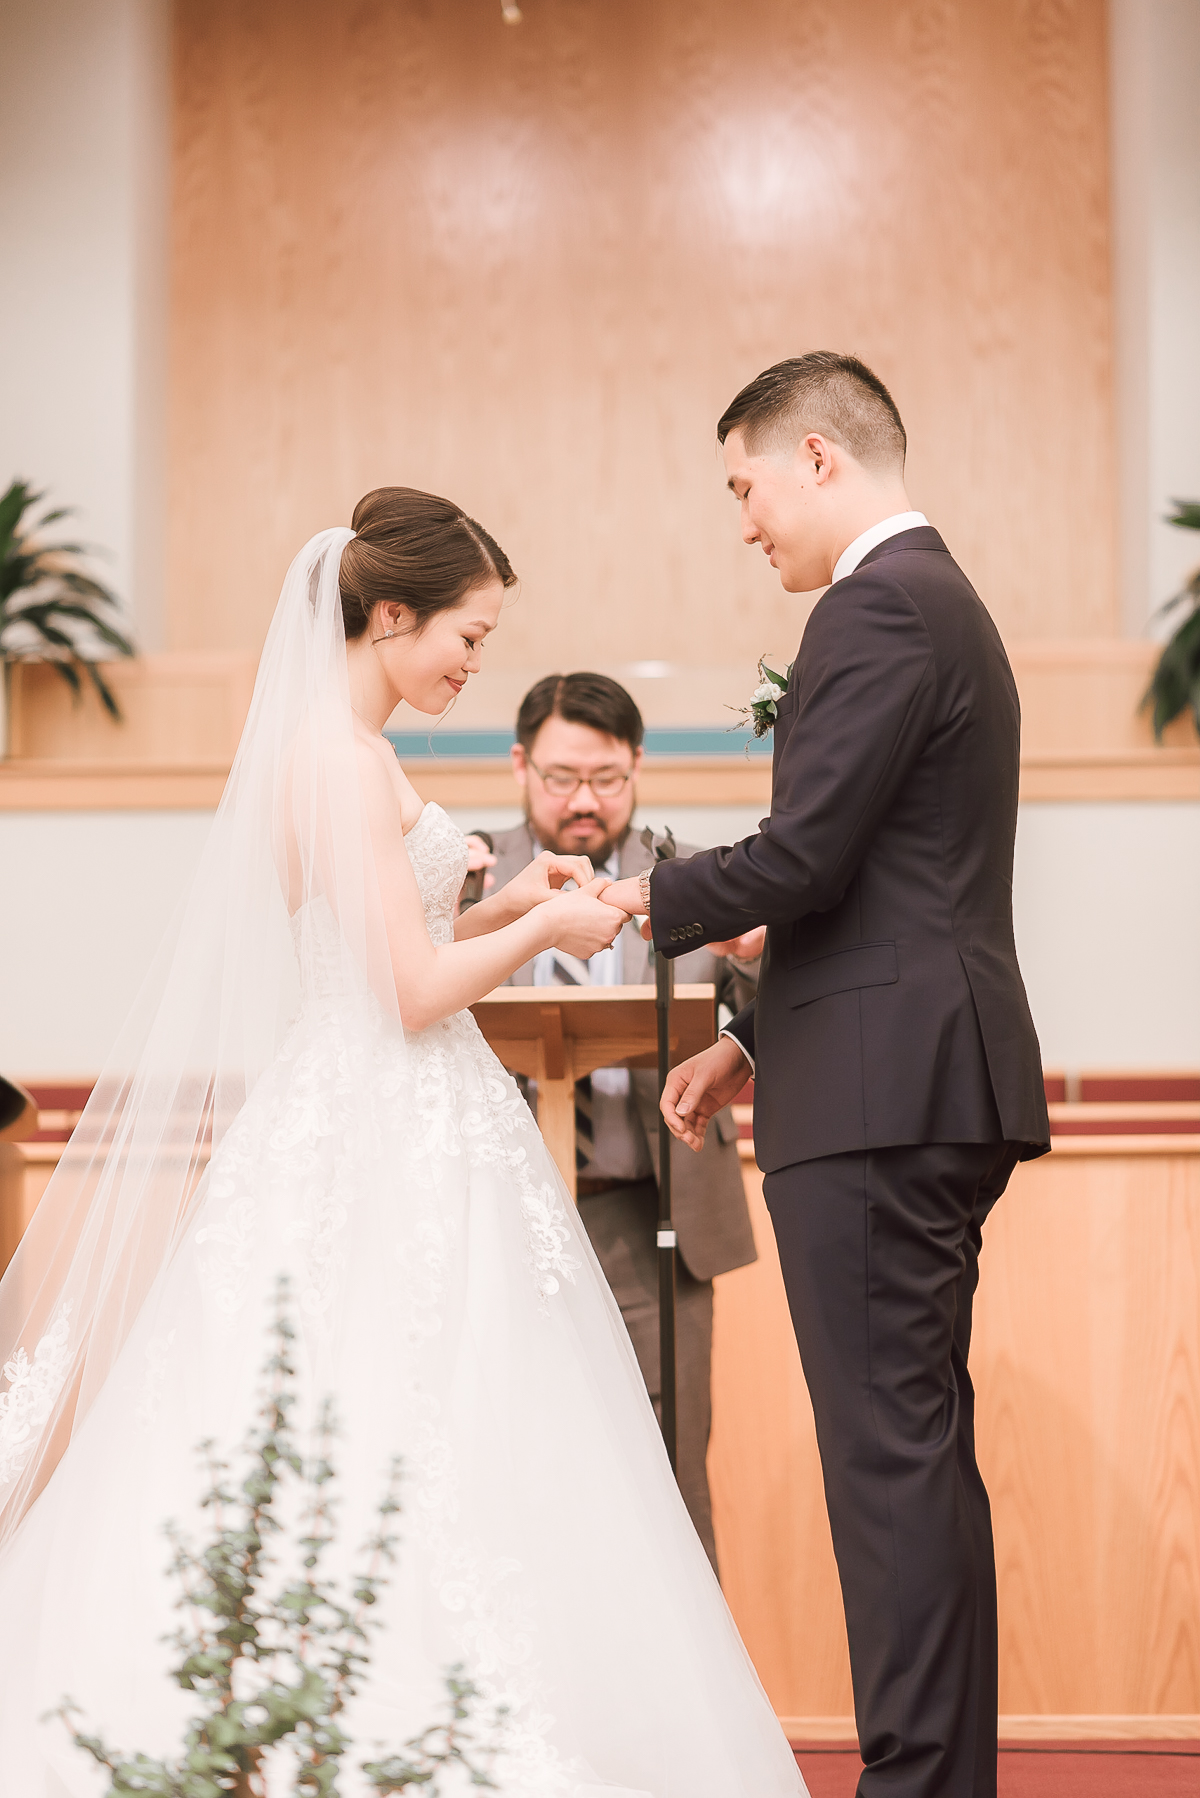 MD-Wedding-Columbia-Inn-Hollywood-Ballroom-Bridal-Party-48.jpg